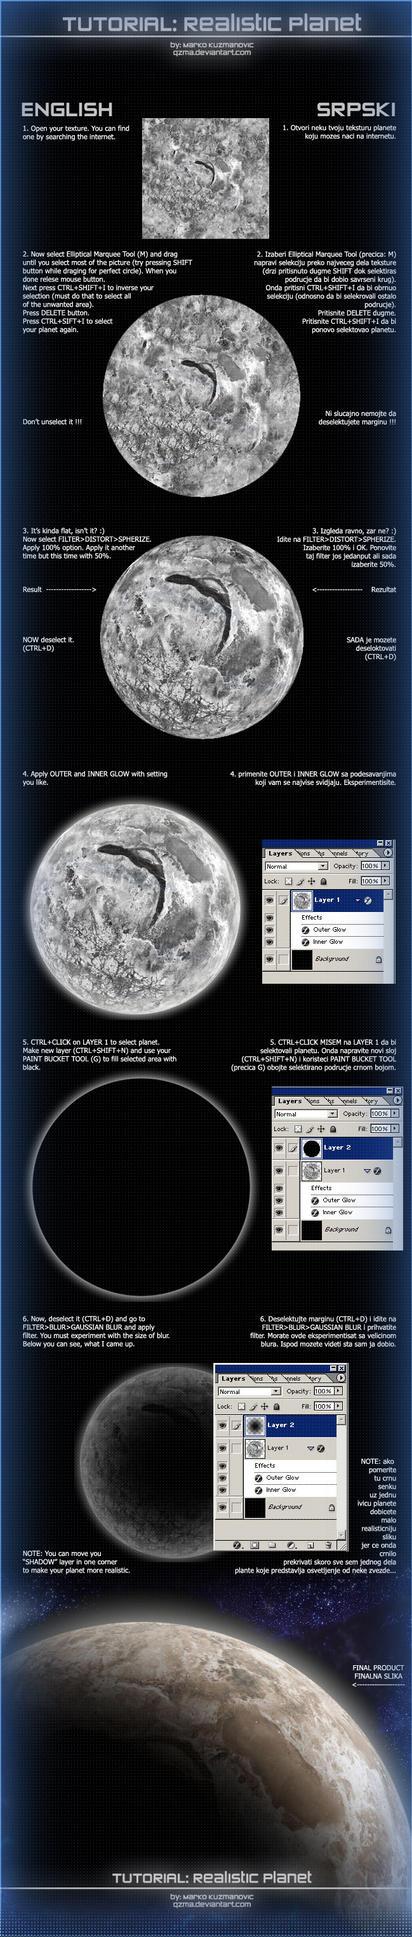 Realistic Planet Tutorial by Qzma